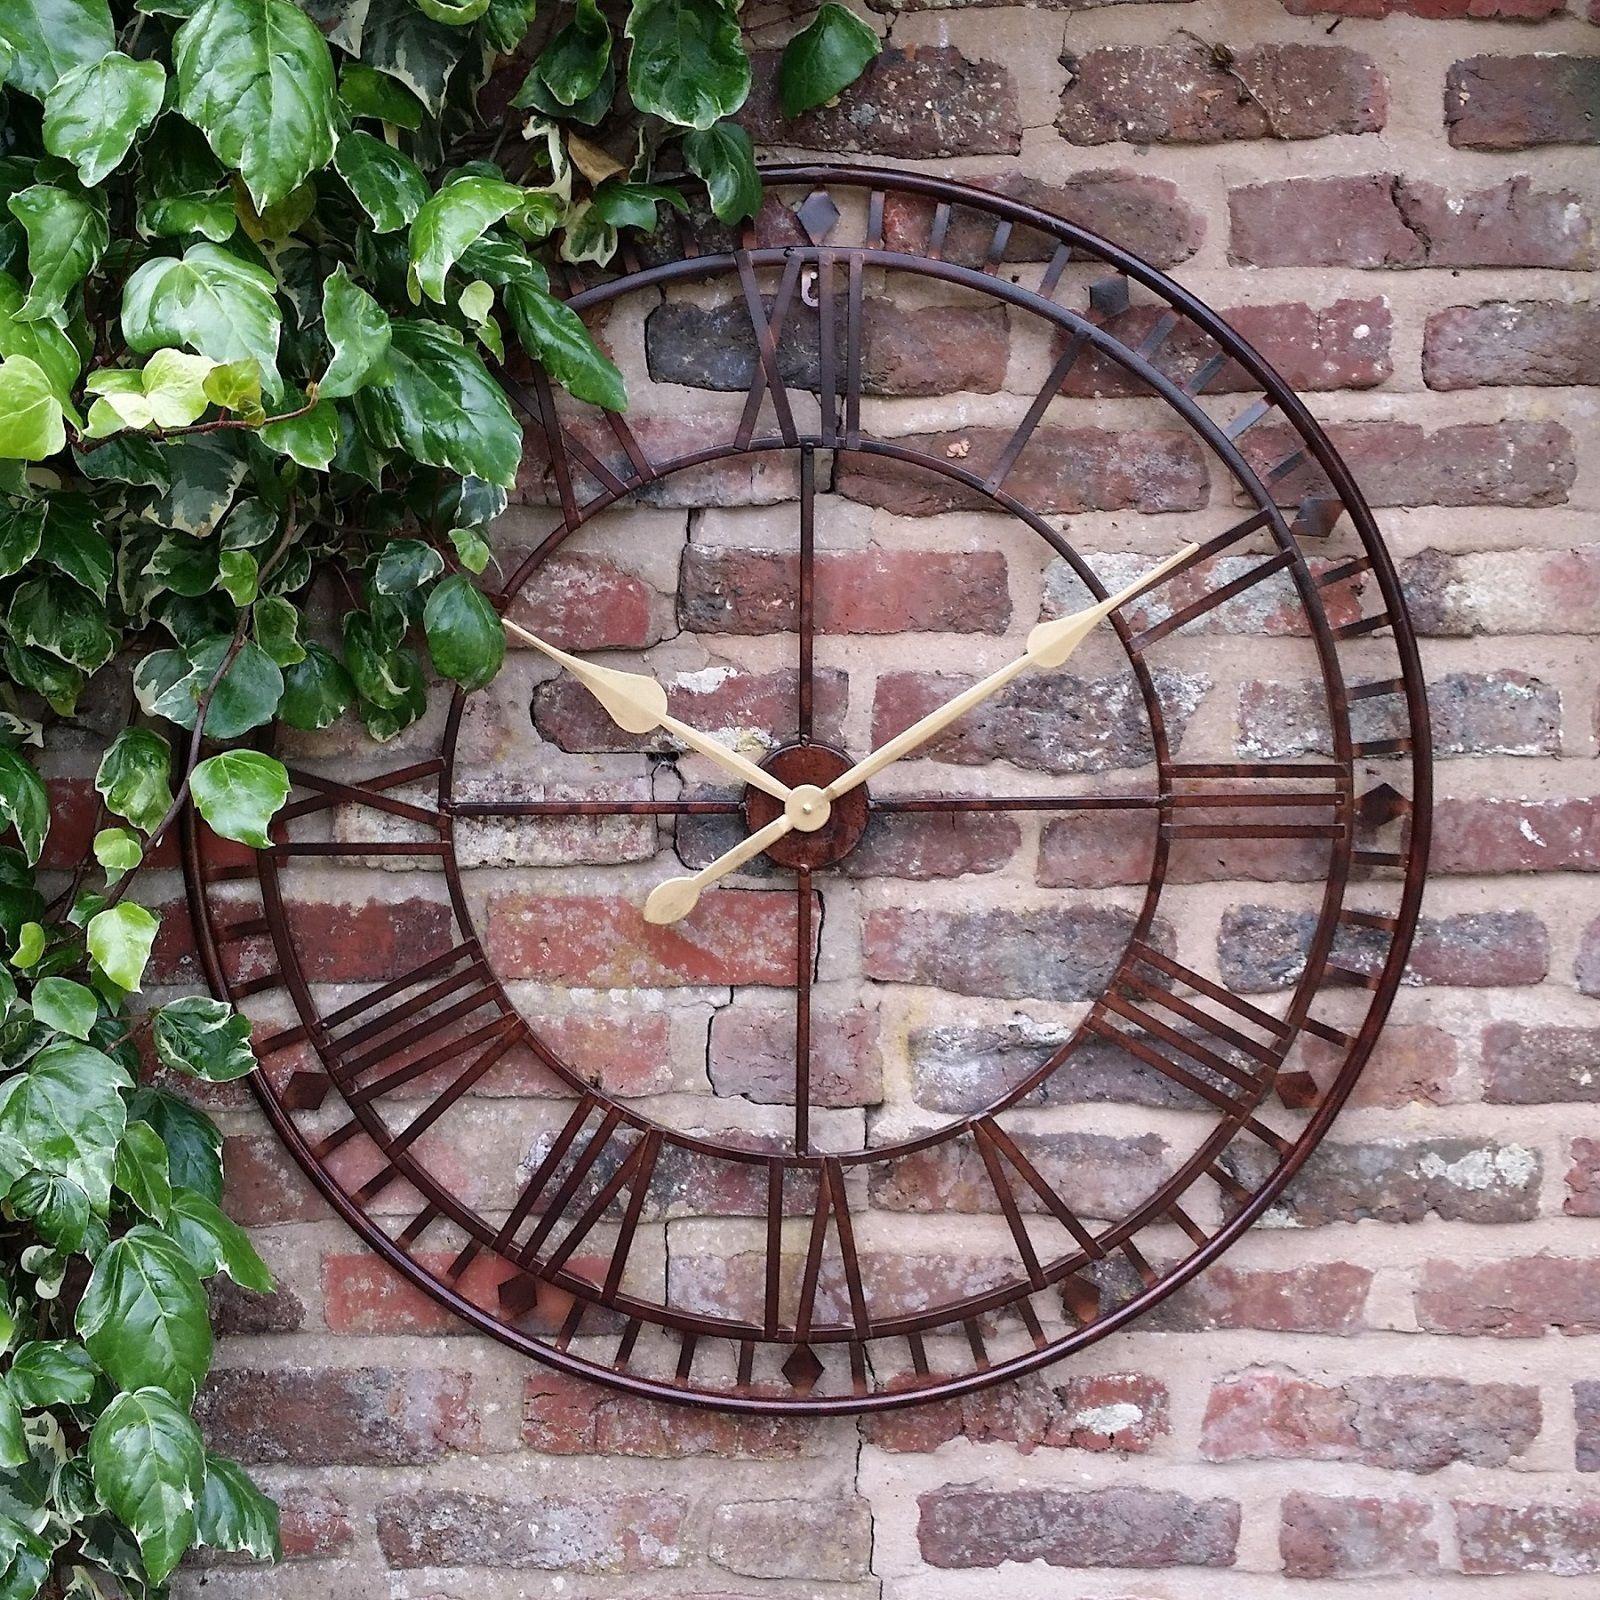 Large Outdoor Garden Wall Clock Big Roman Numerals Giant Open Face